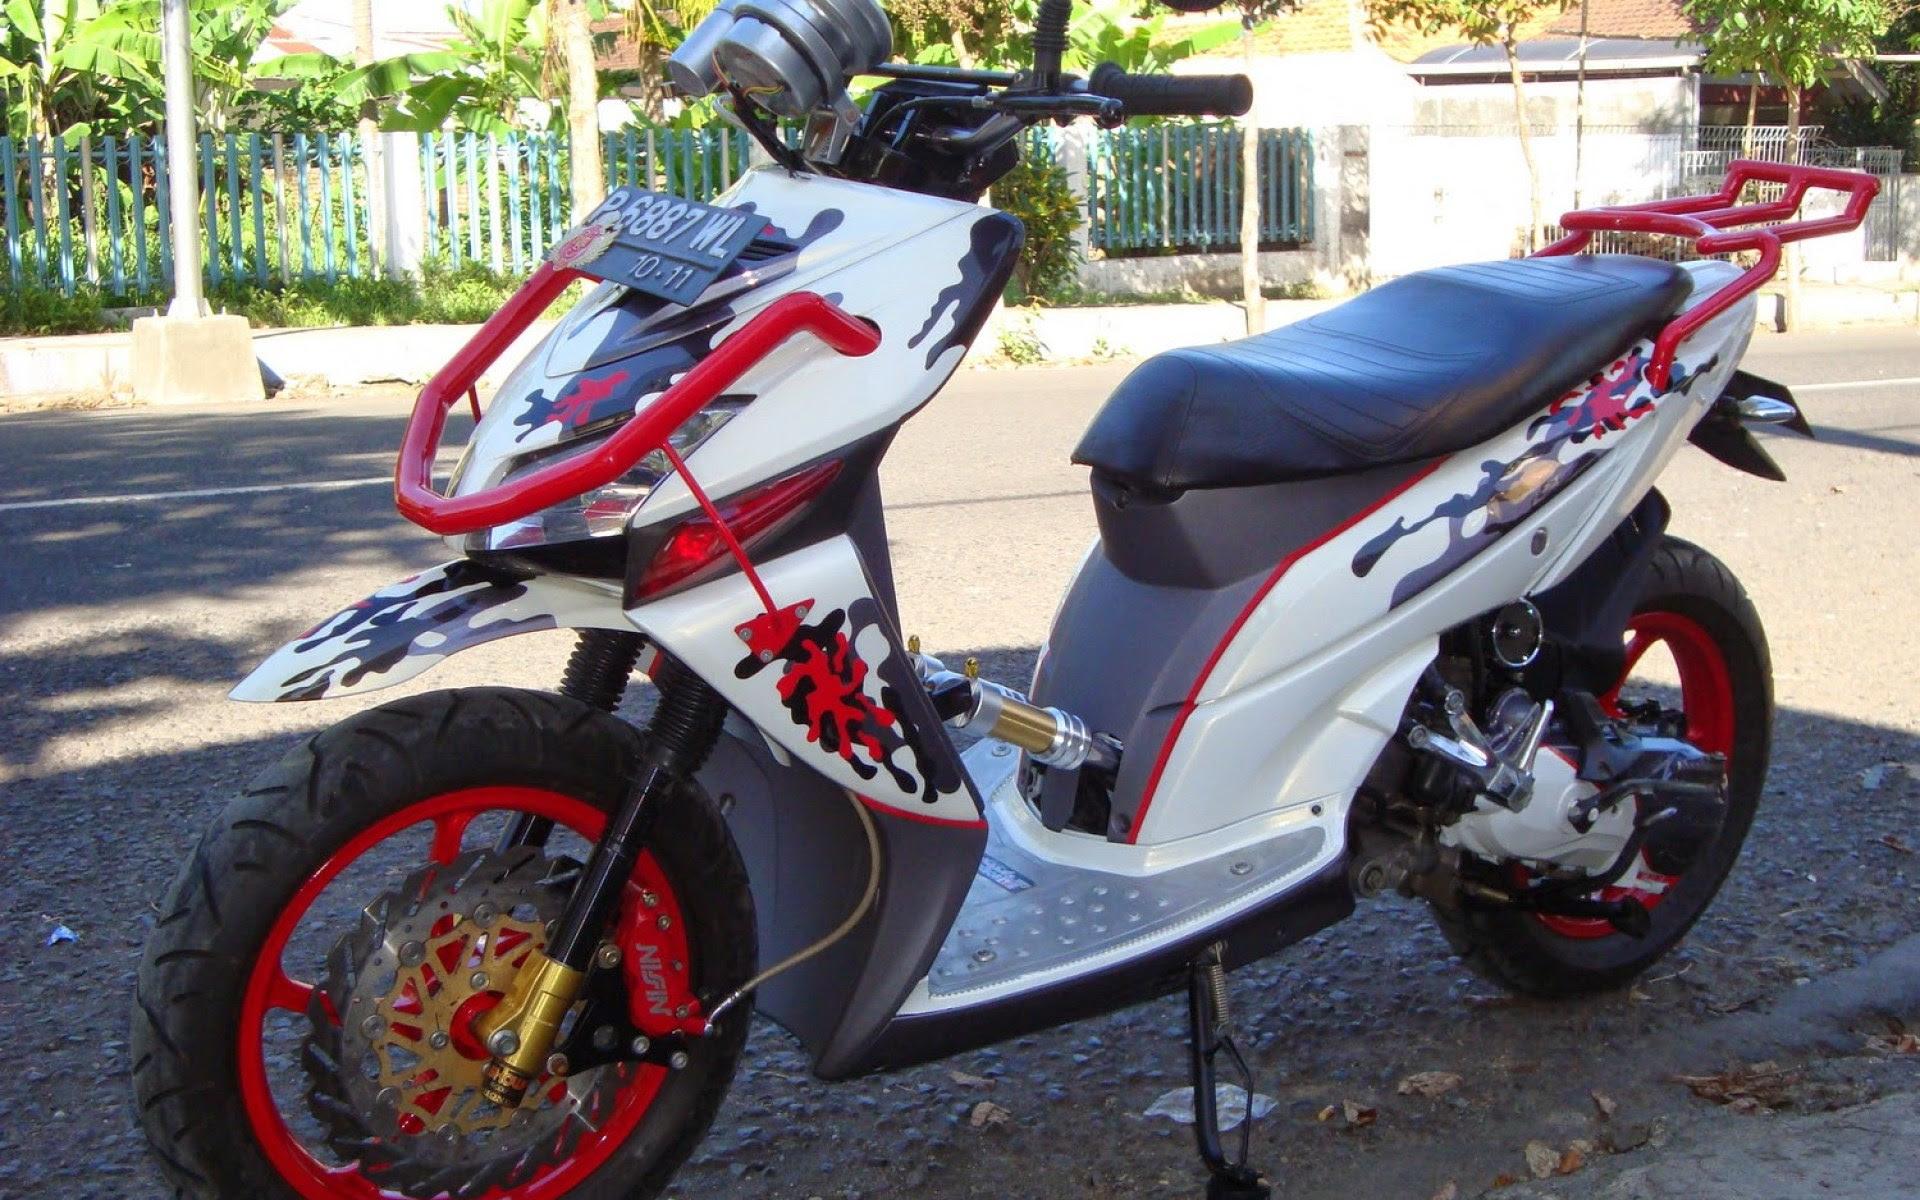 Koleksi Modifikasi Motor Matic Suzuki Skywave Terbaru Modifikasi